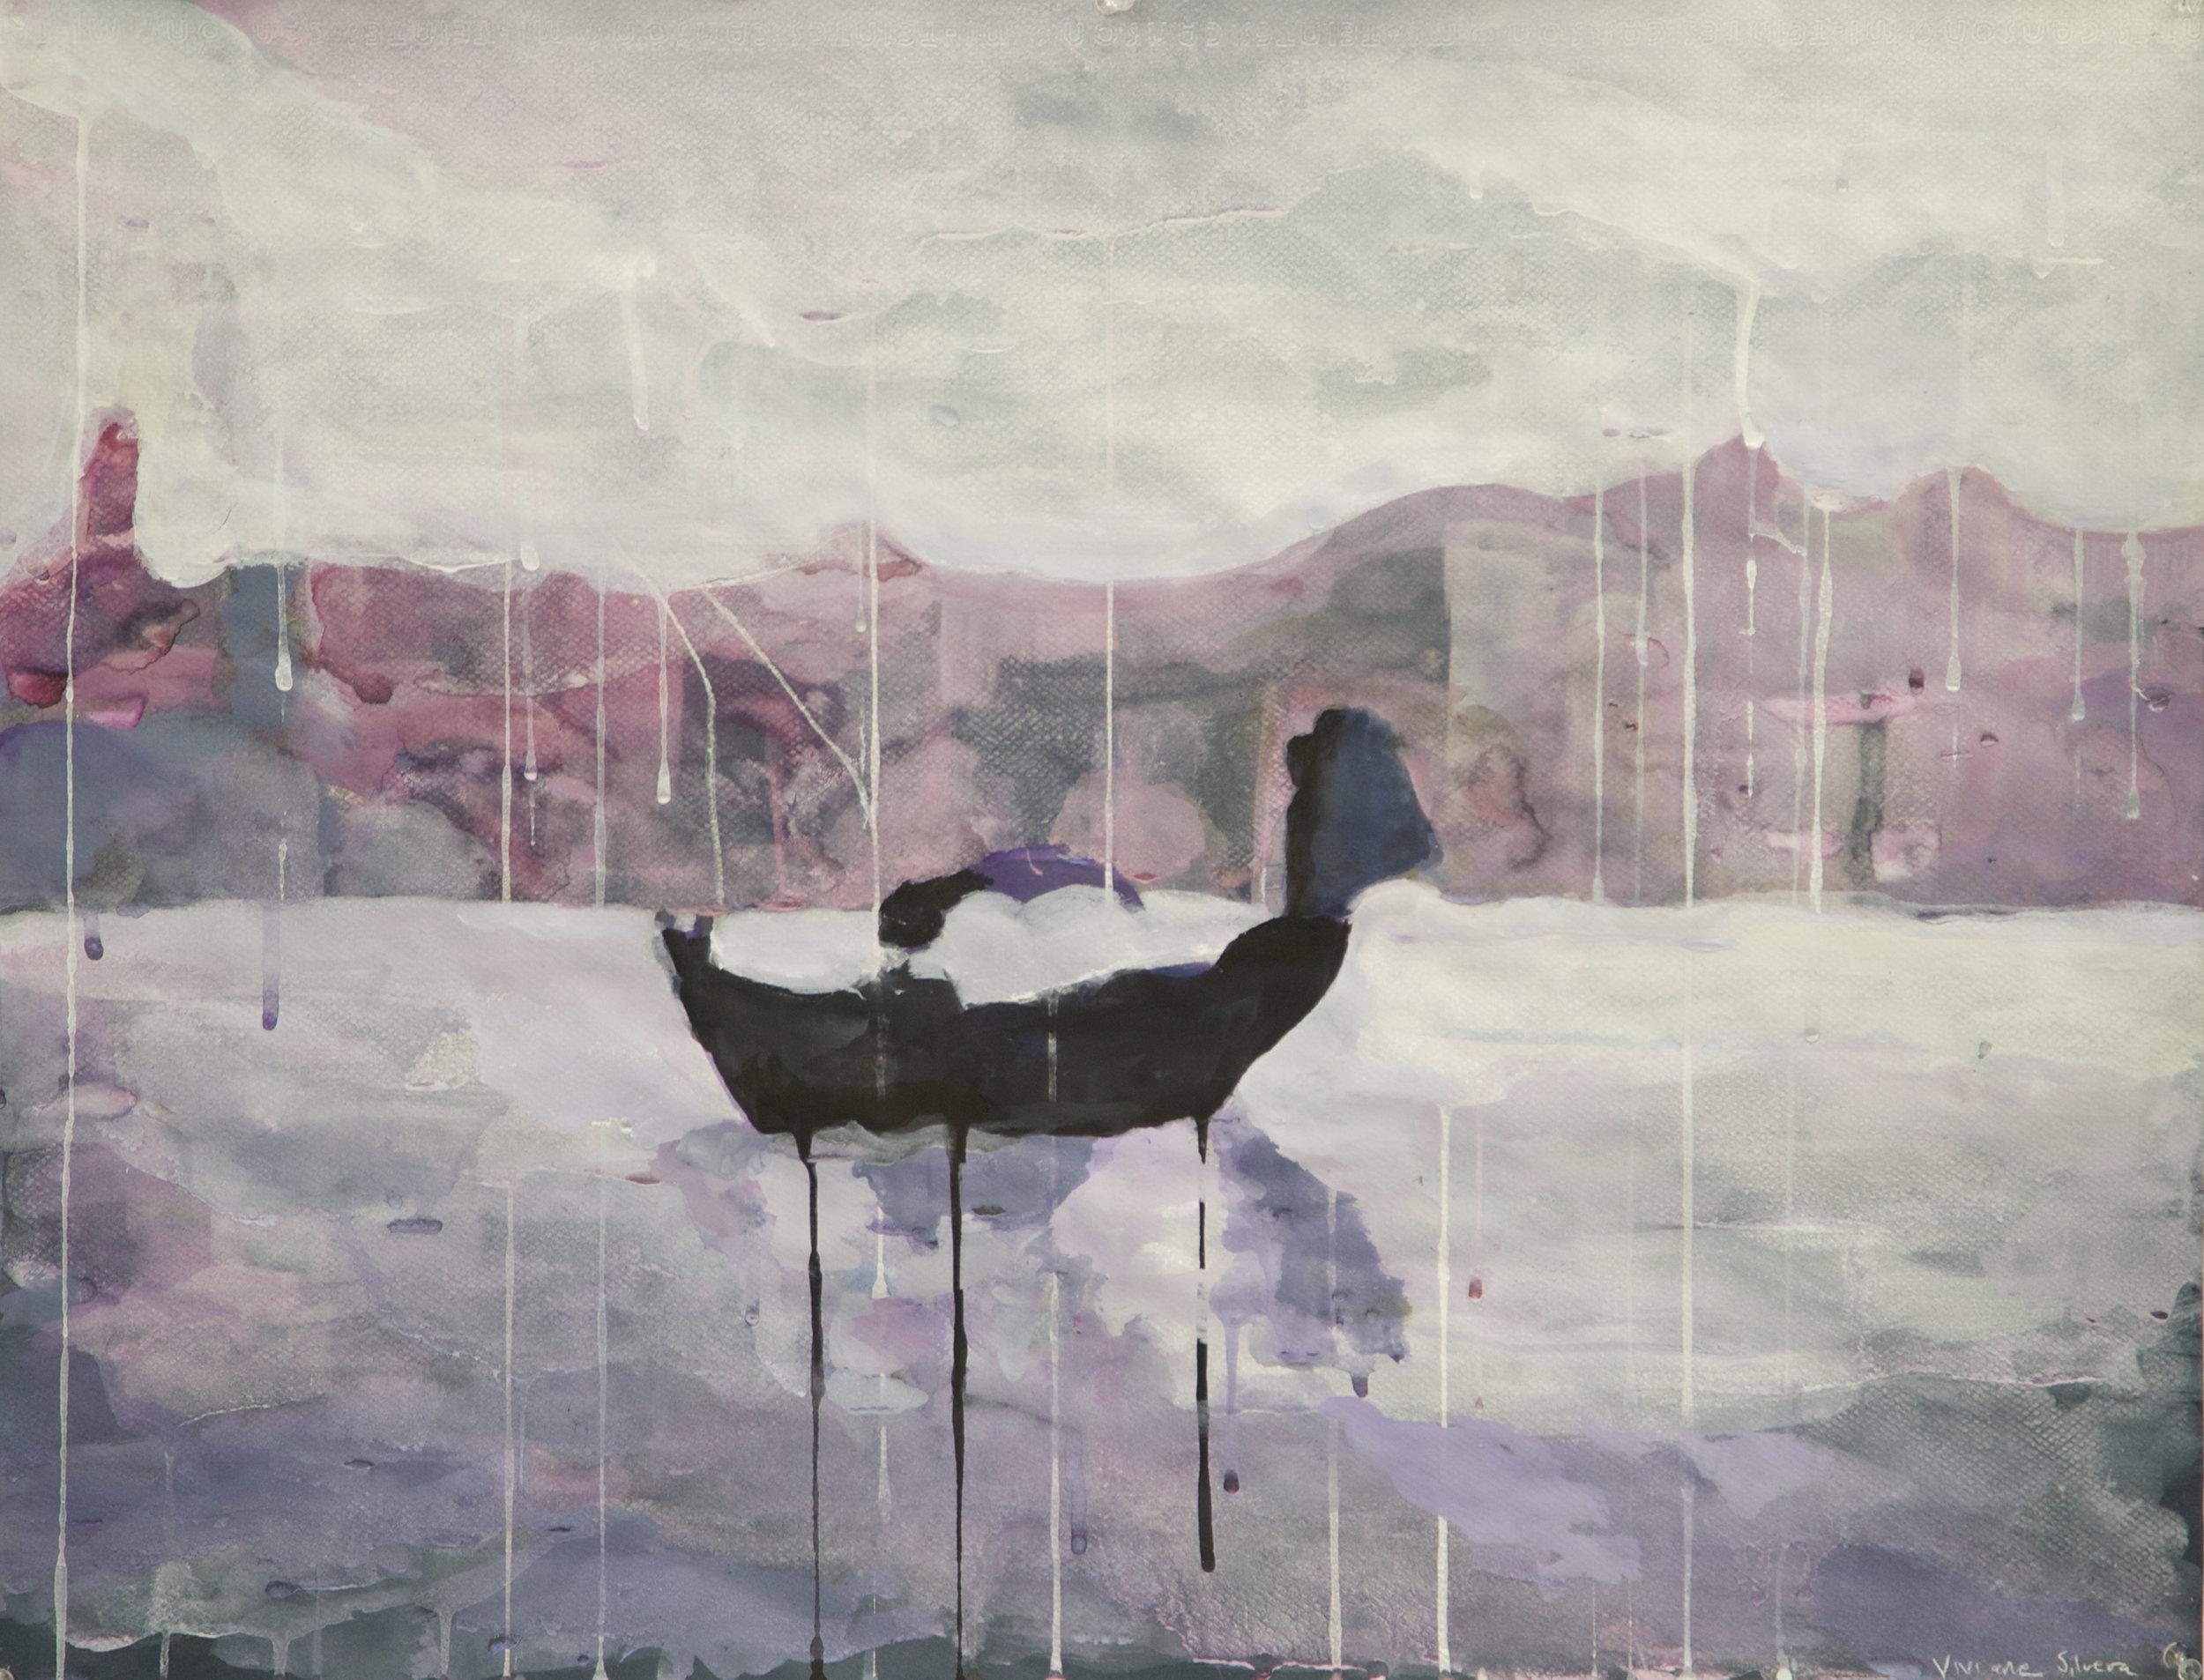 "The Boat Dream 25.5"" x 19.5"" Gouache on paper 2014"